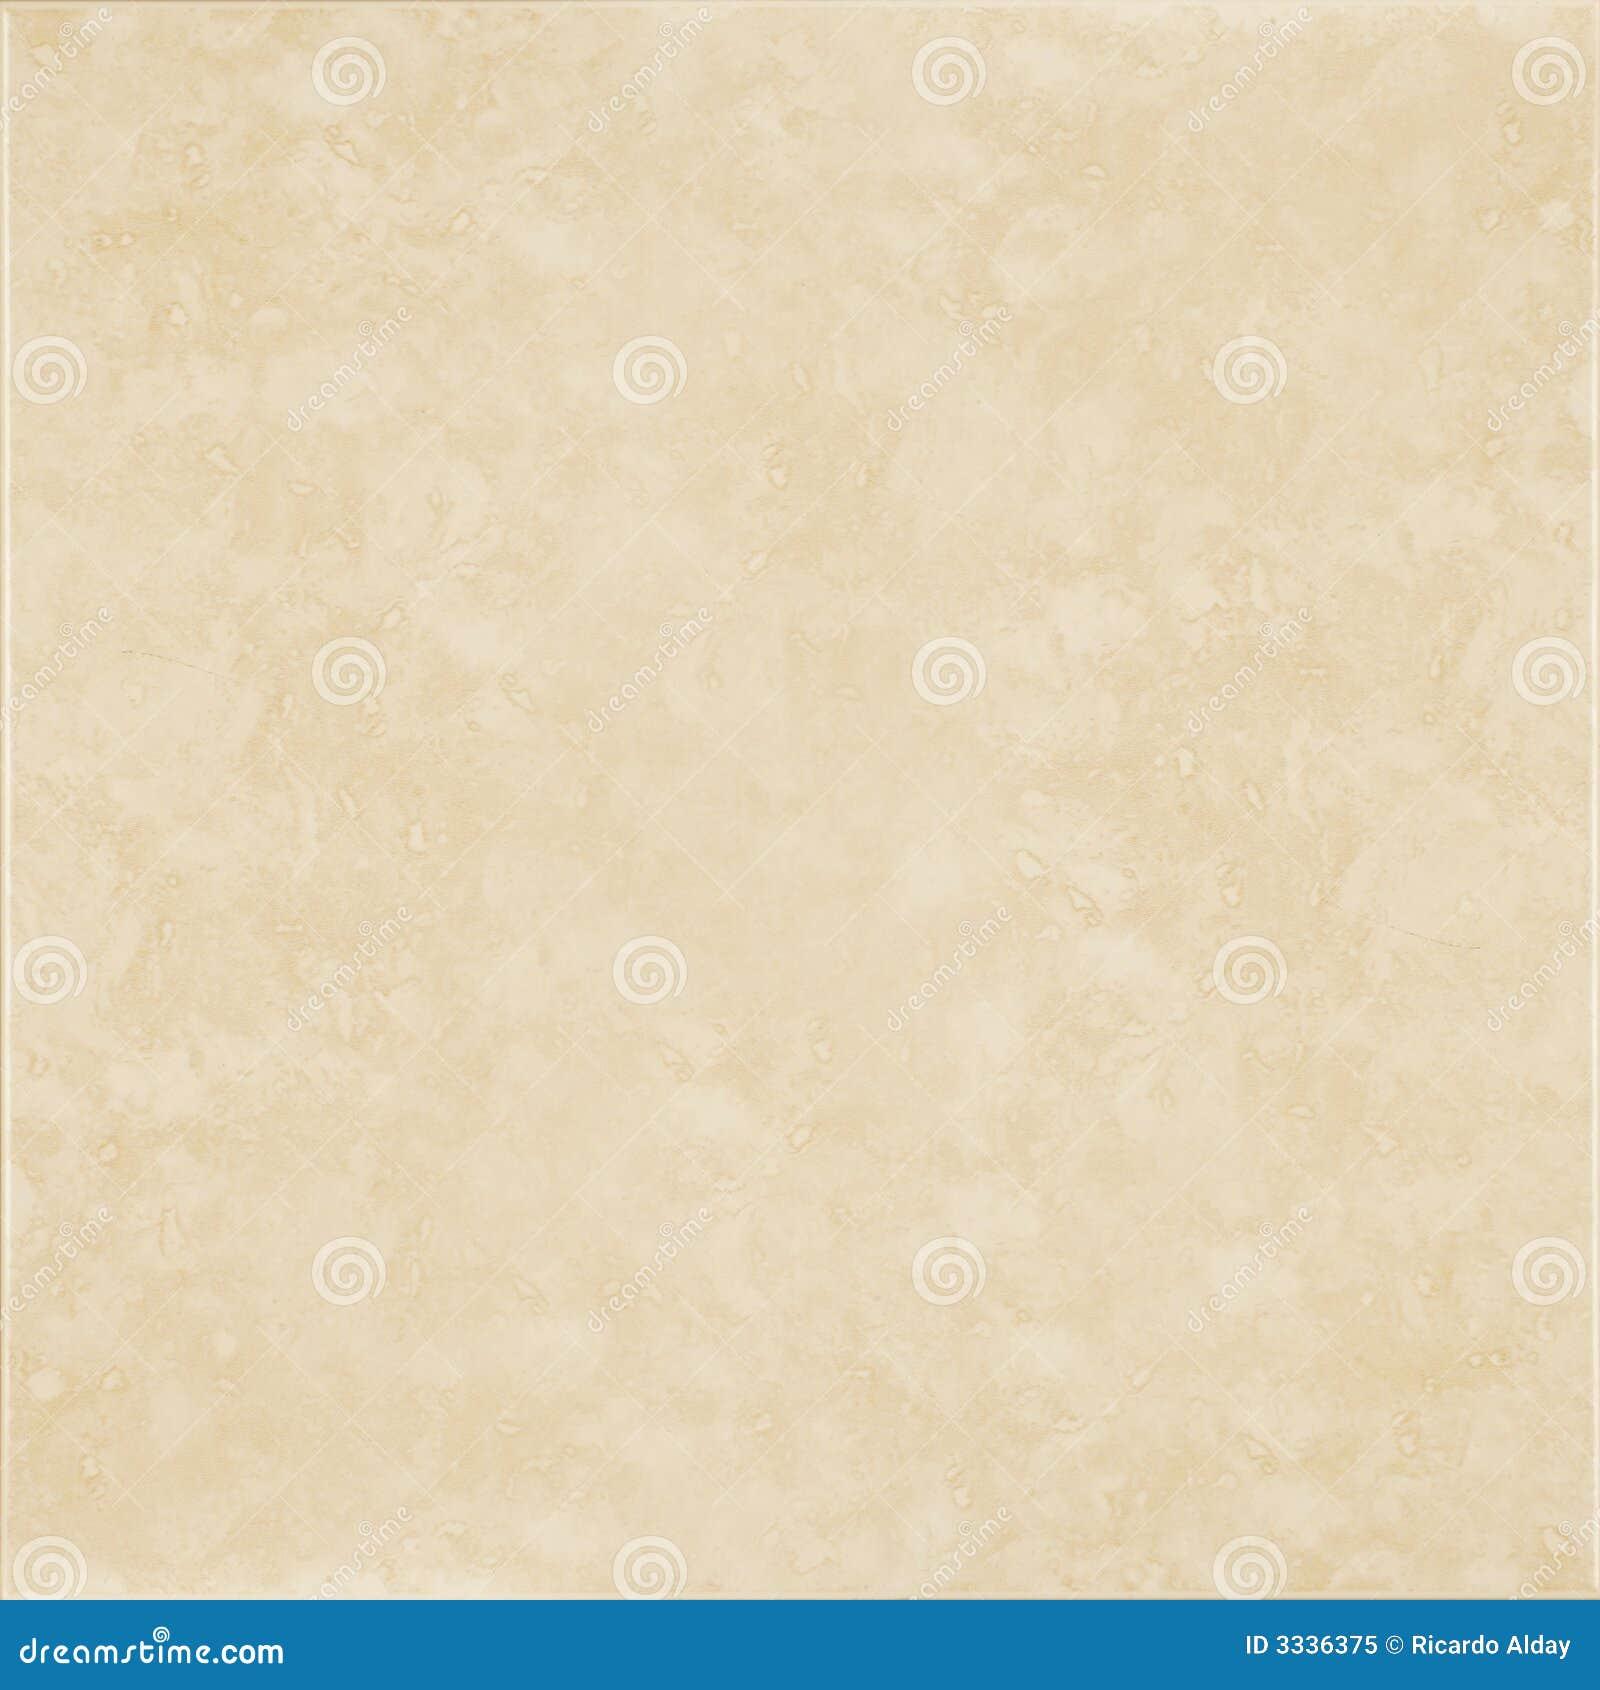 Beige Ceramic Tile Royalty Free Stock Photo - Image: 3336375